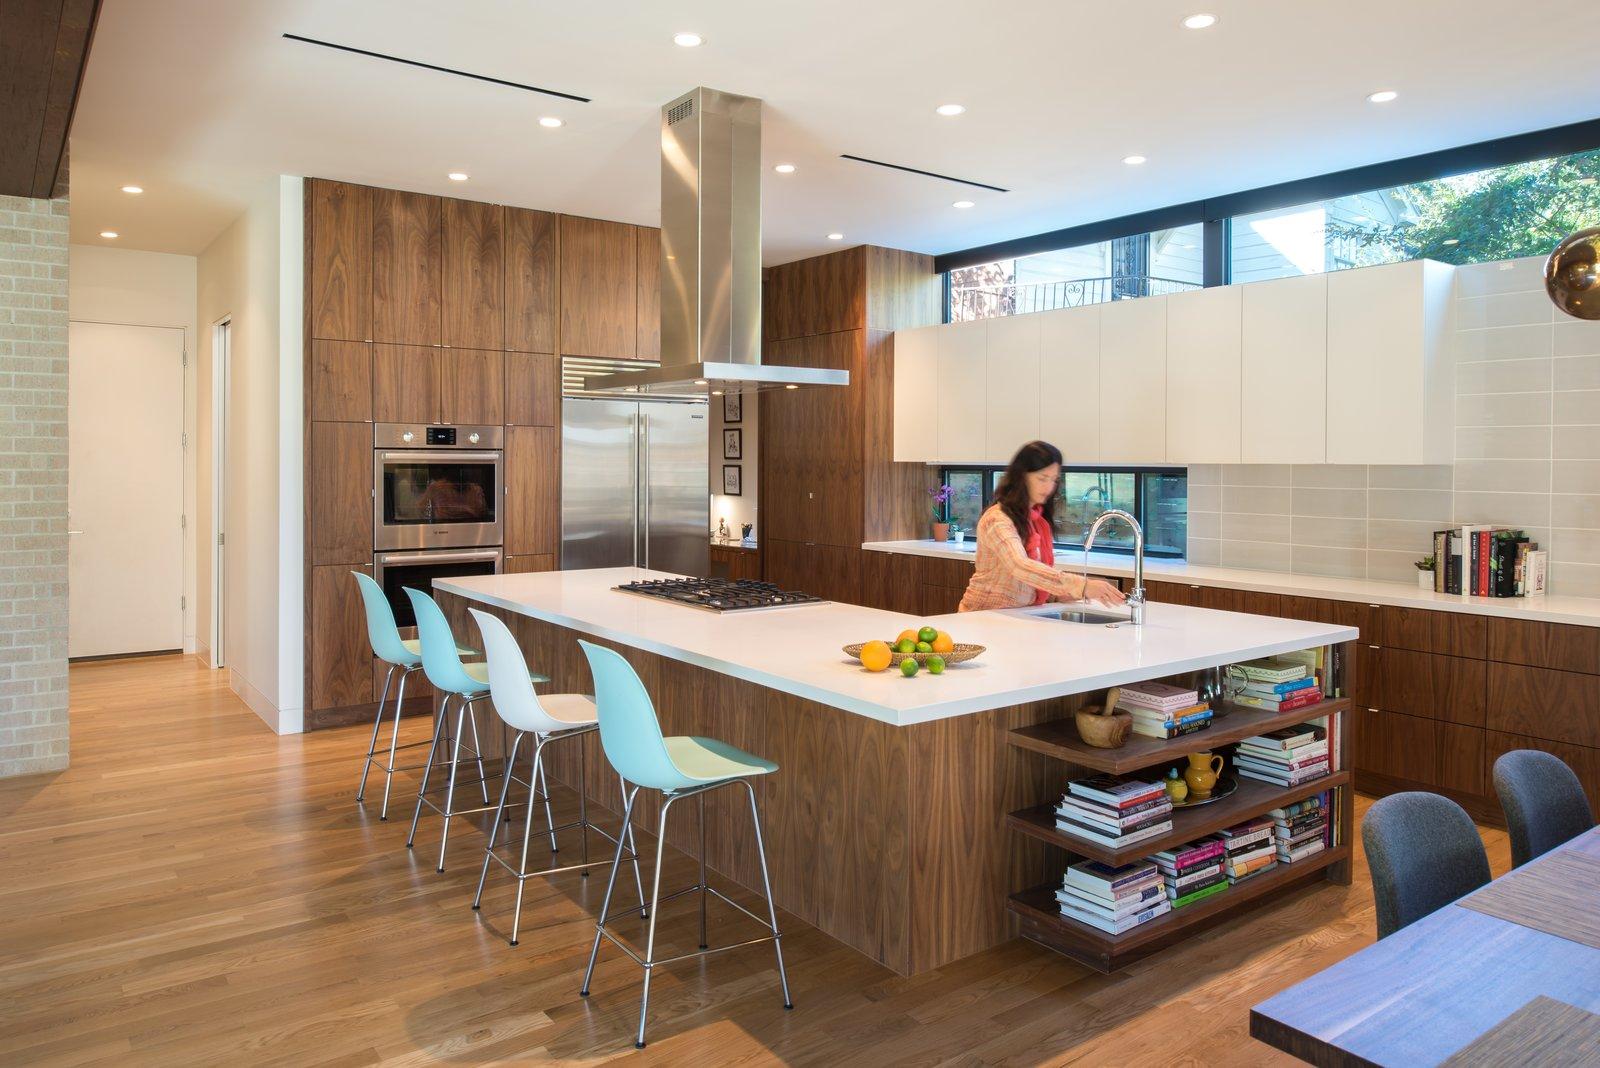 Kitchen, Wall Oven, Engineered Quartz, Undermount, White, Wood, Refrigerator, and Light Hardwood Interior View  Best Kitchen Engineered Quartz Undermount Light Hardwood Photos from McClendon Residence